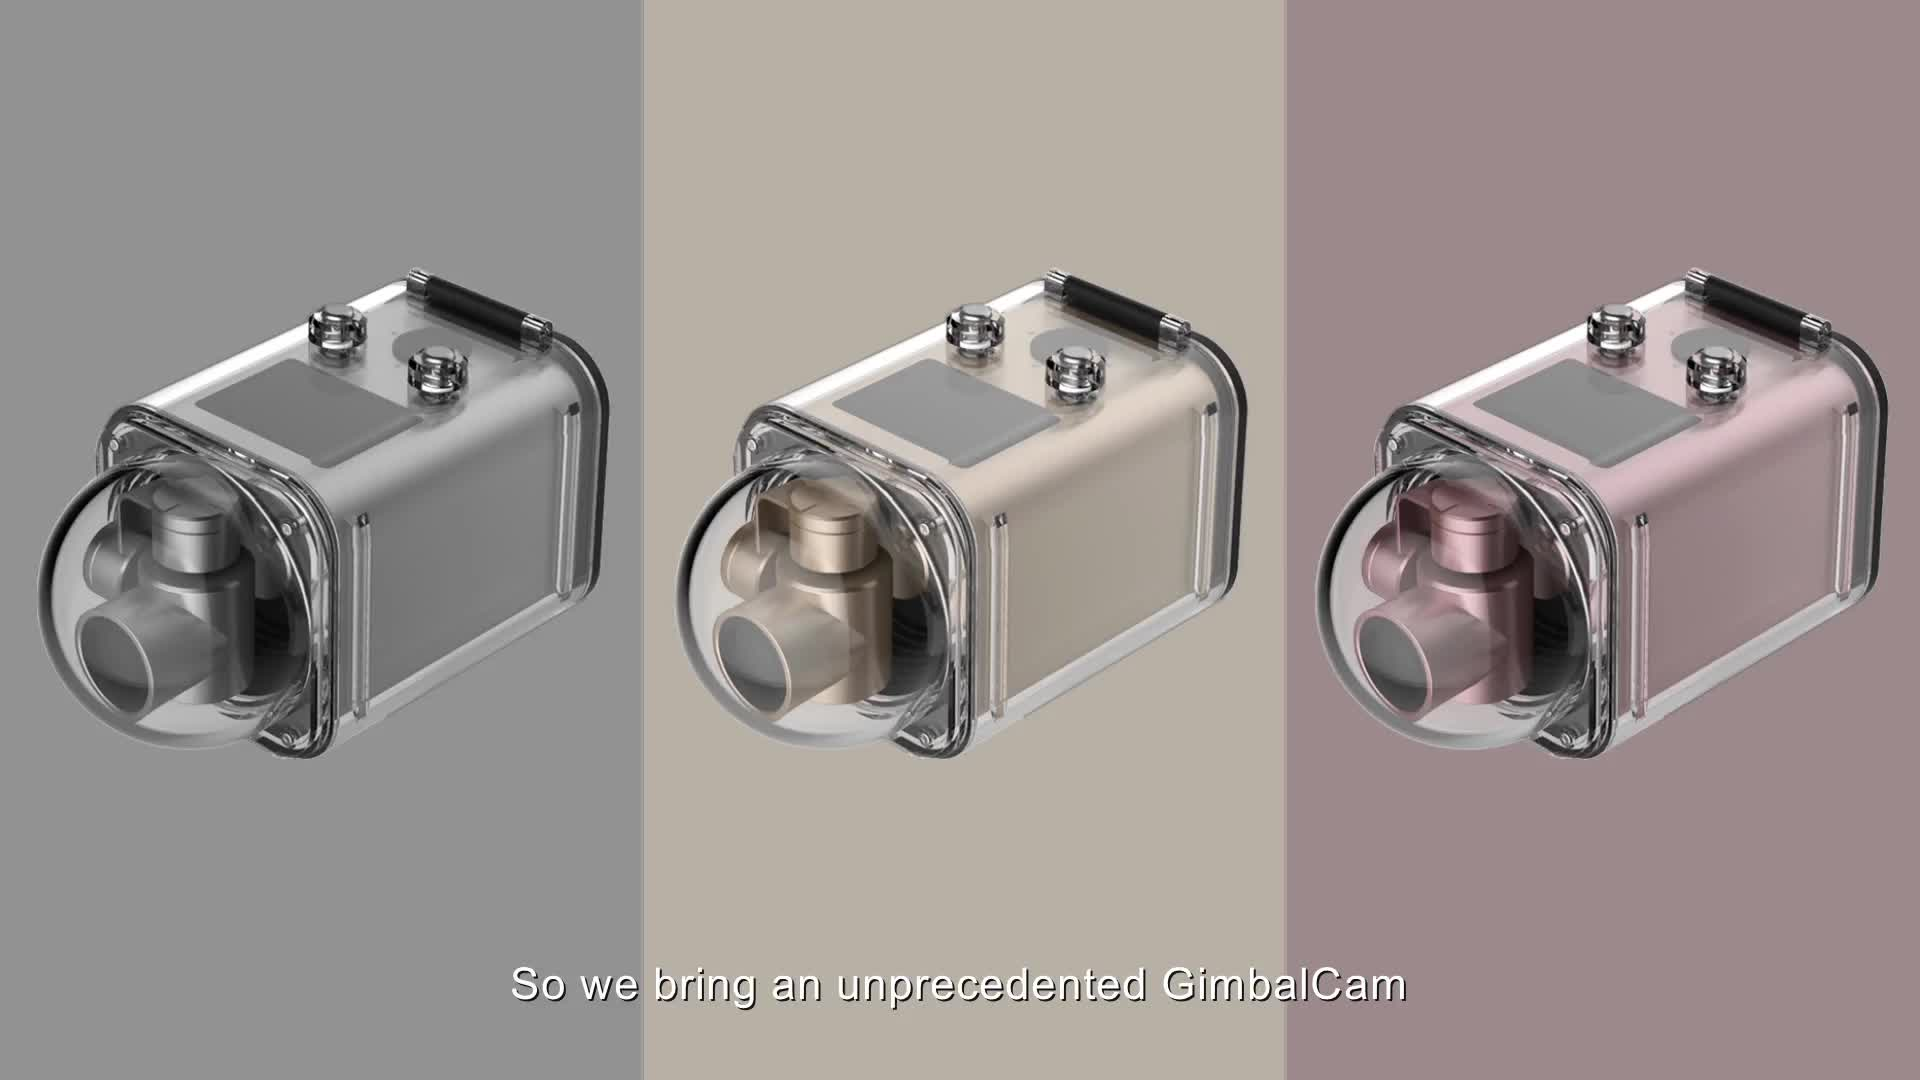 Dahili Gimbal Kamera Panoramik Kablosuz Su Geçirmez Eylem Kamera AM800A